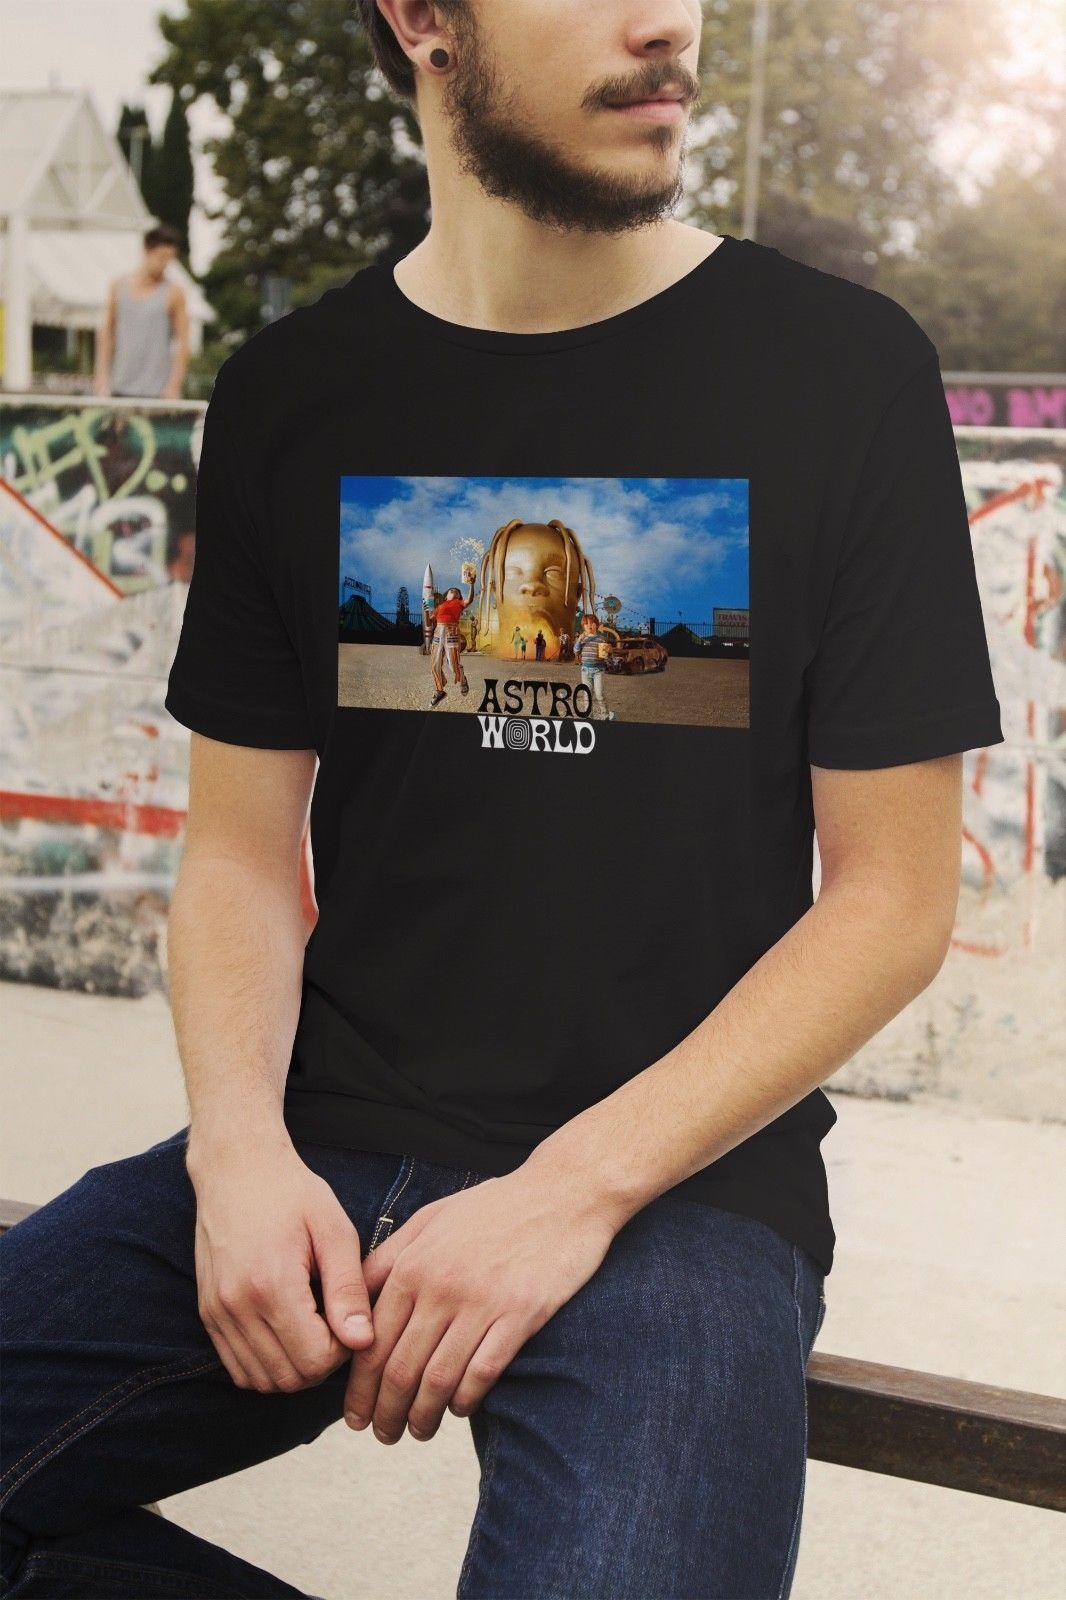 Travis Scott Astroworld T Shirt Drake Kylie Jenner Sicko Mode Merchandise  Men Women Unisex Fashion Tshirt Cool Looking T Shirts Buy Designer Shirts  From ... 3749dcebf1fd